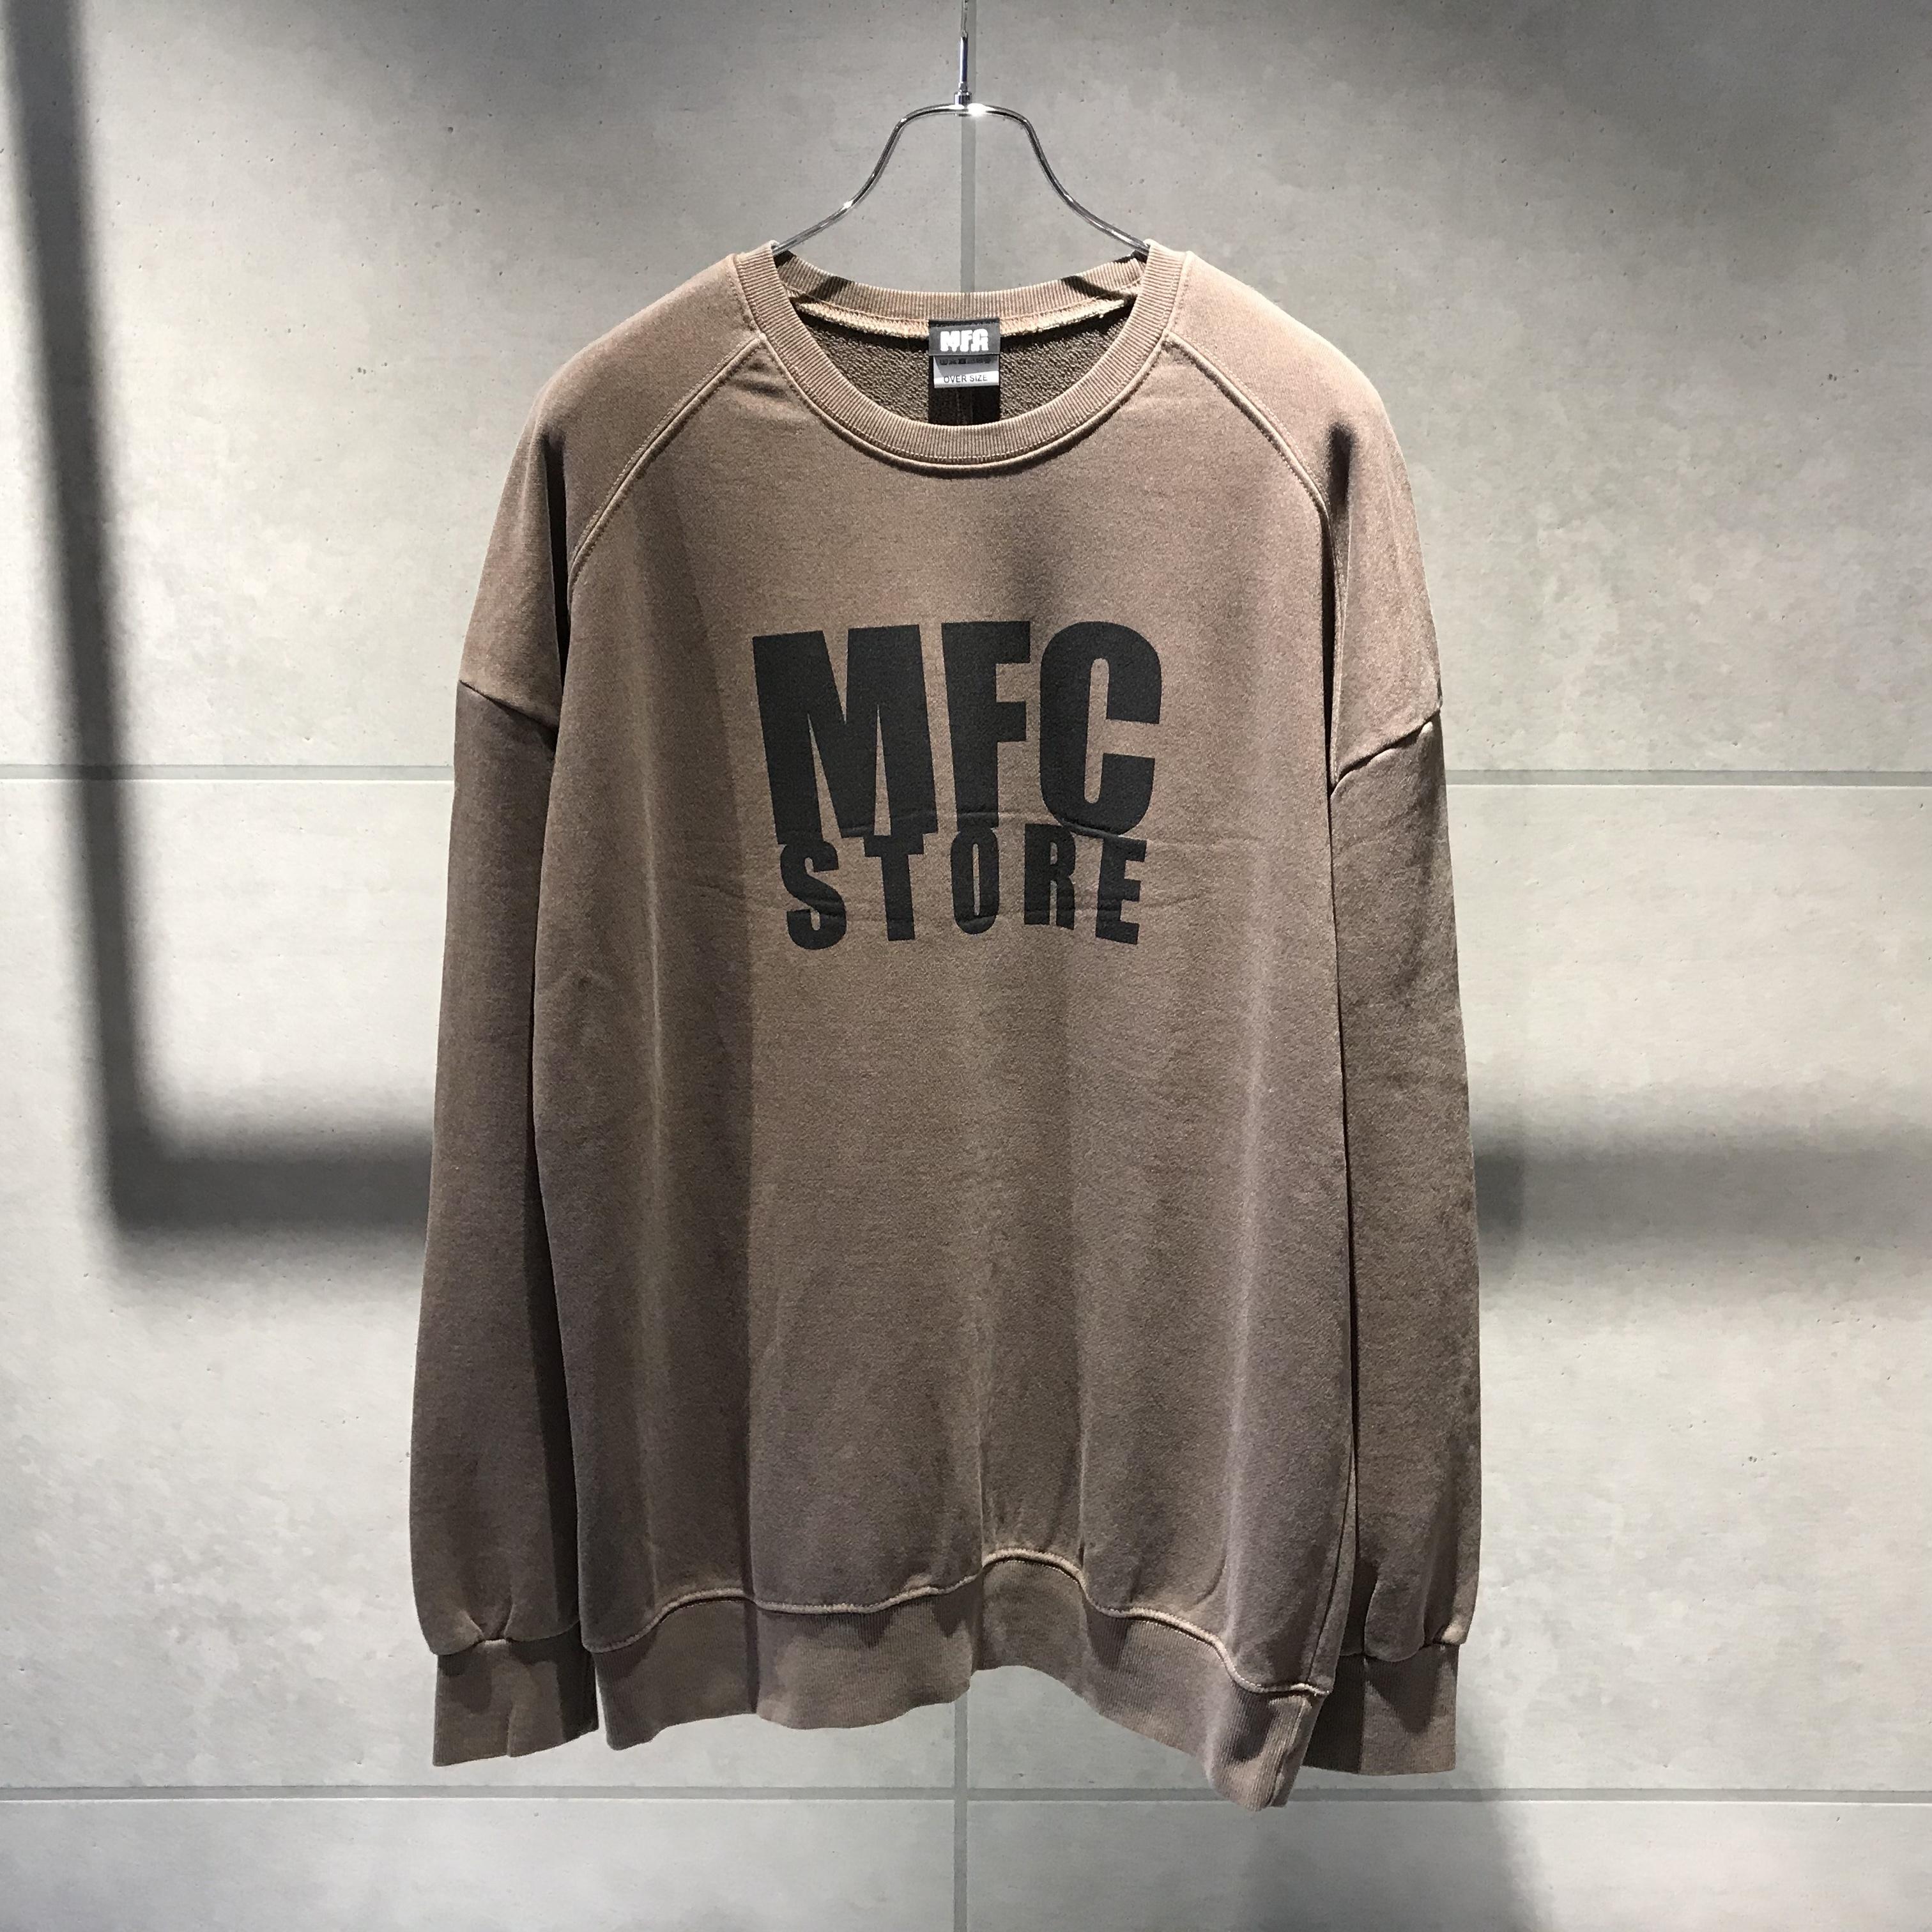 MFC STORE LOGO CREWNECK OVER SWEATSHIRT / BROWN